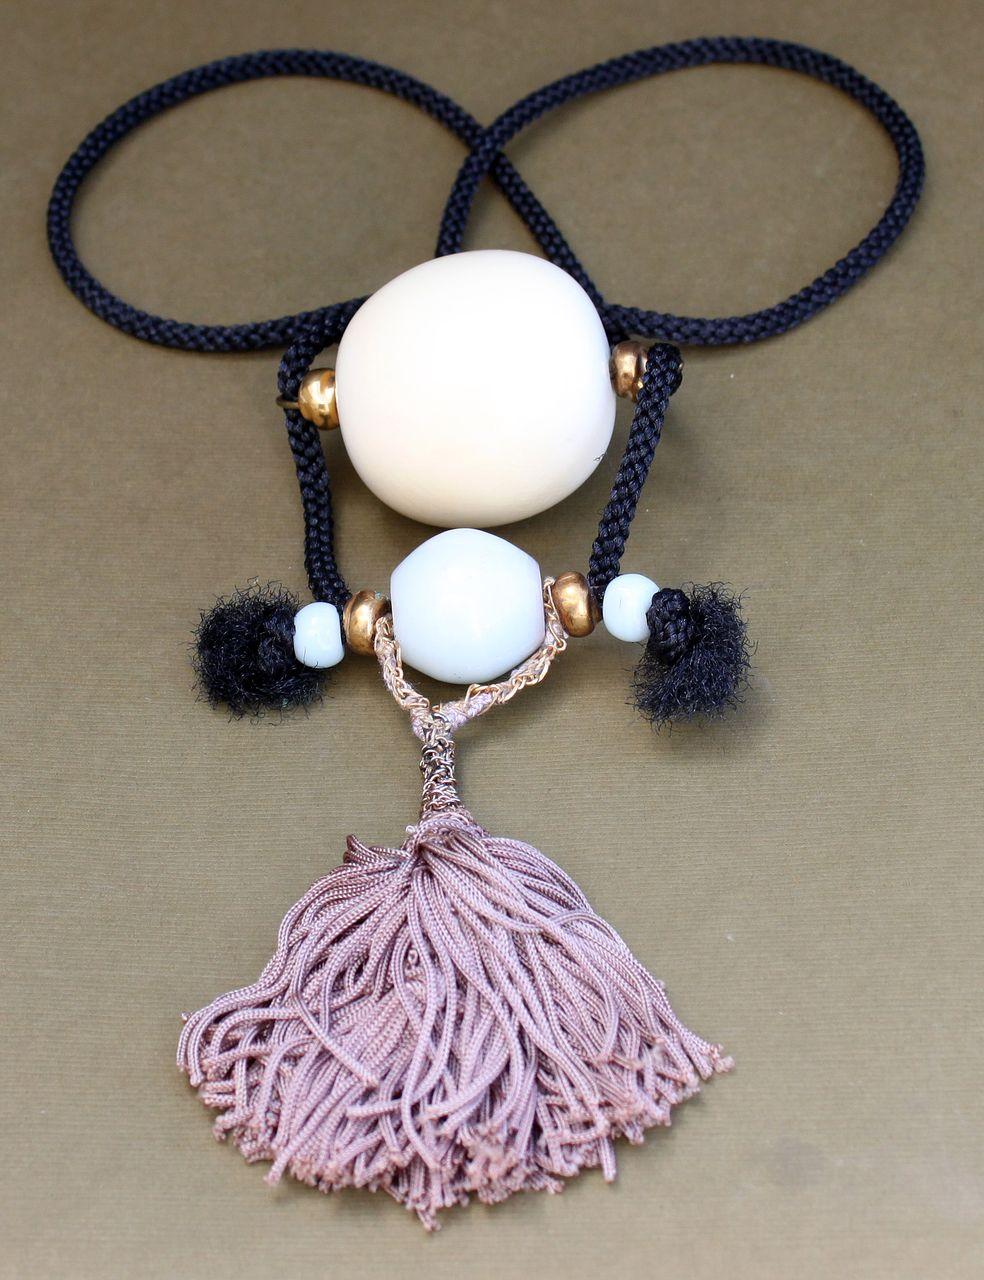 Vintage Chinese Peking Glass & Huge Ivory Bead Necklace